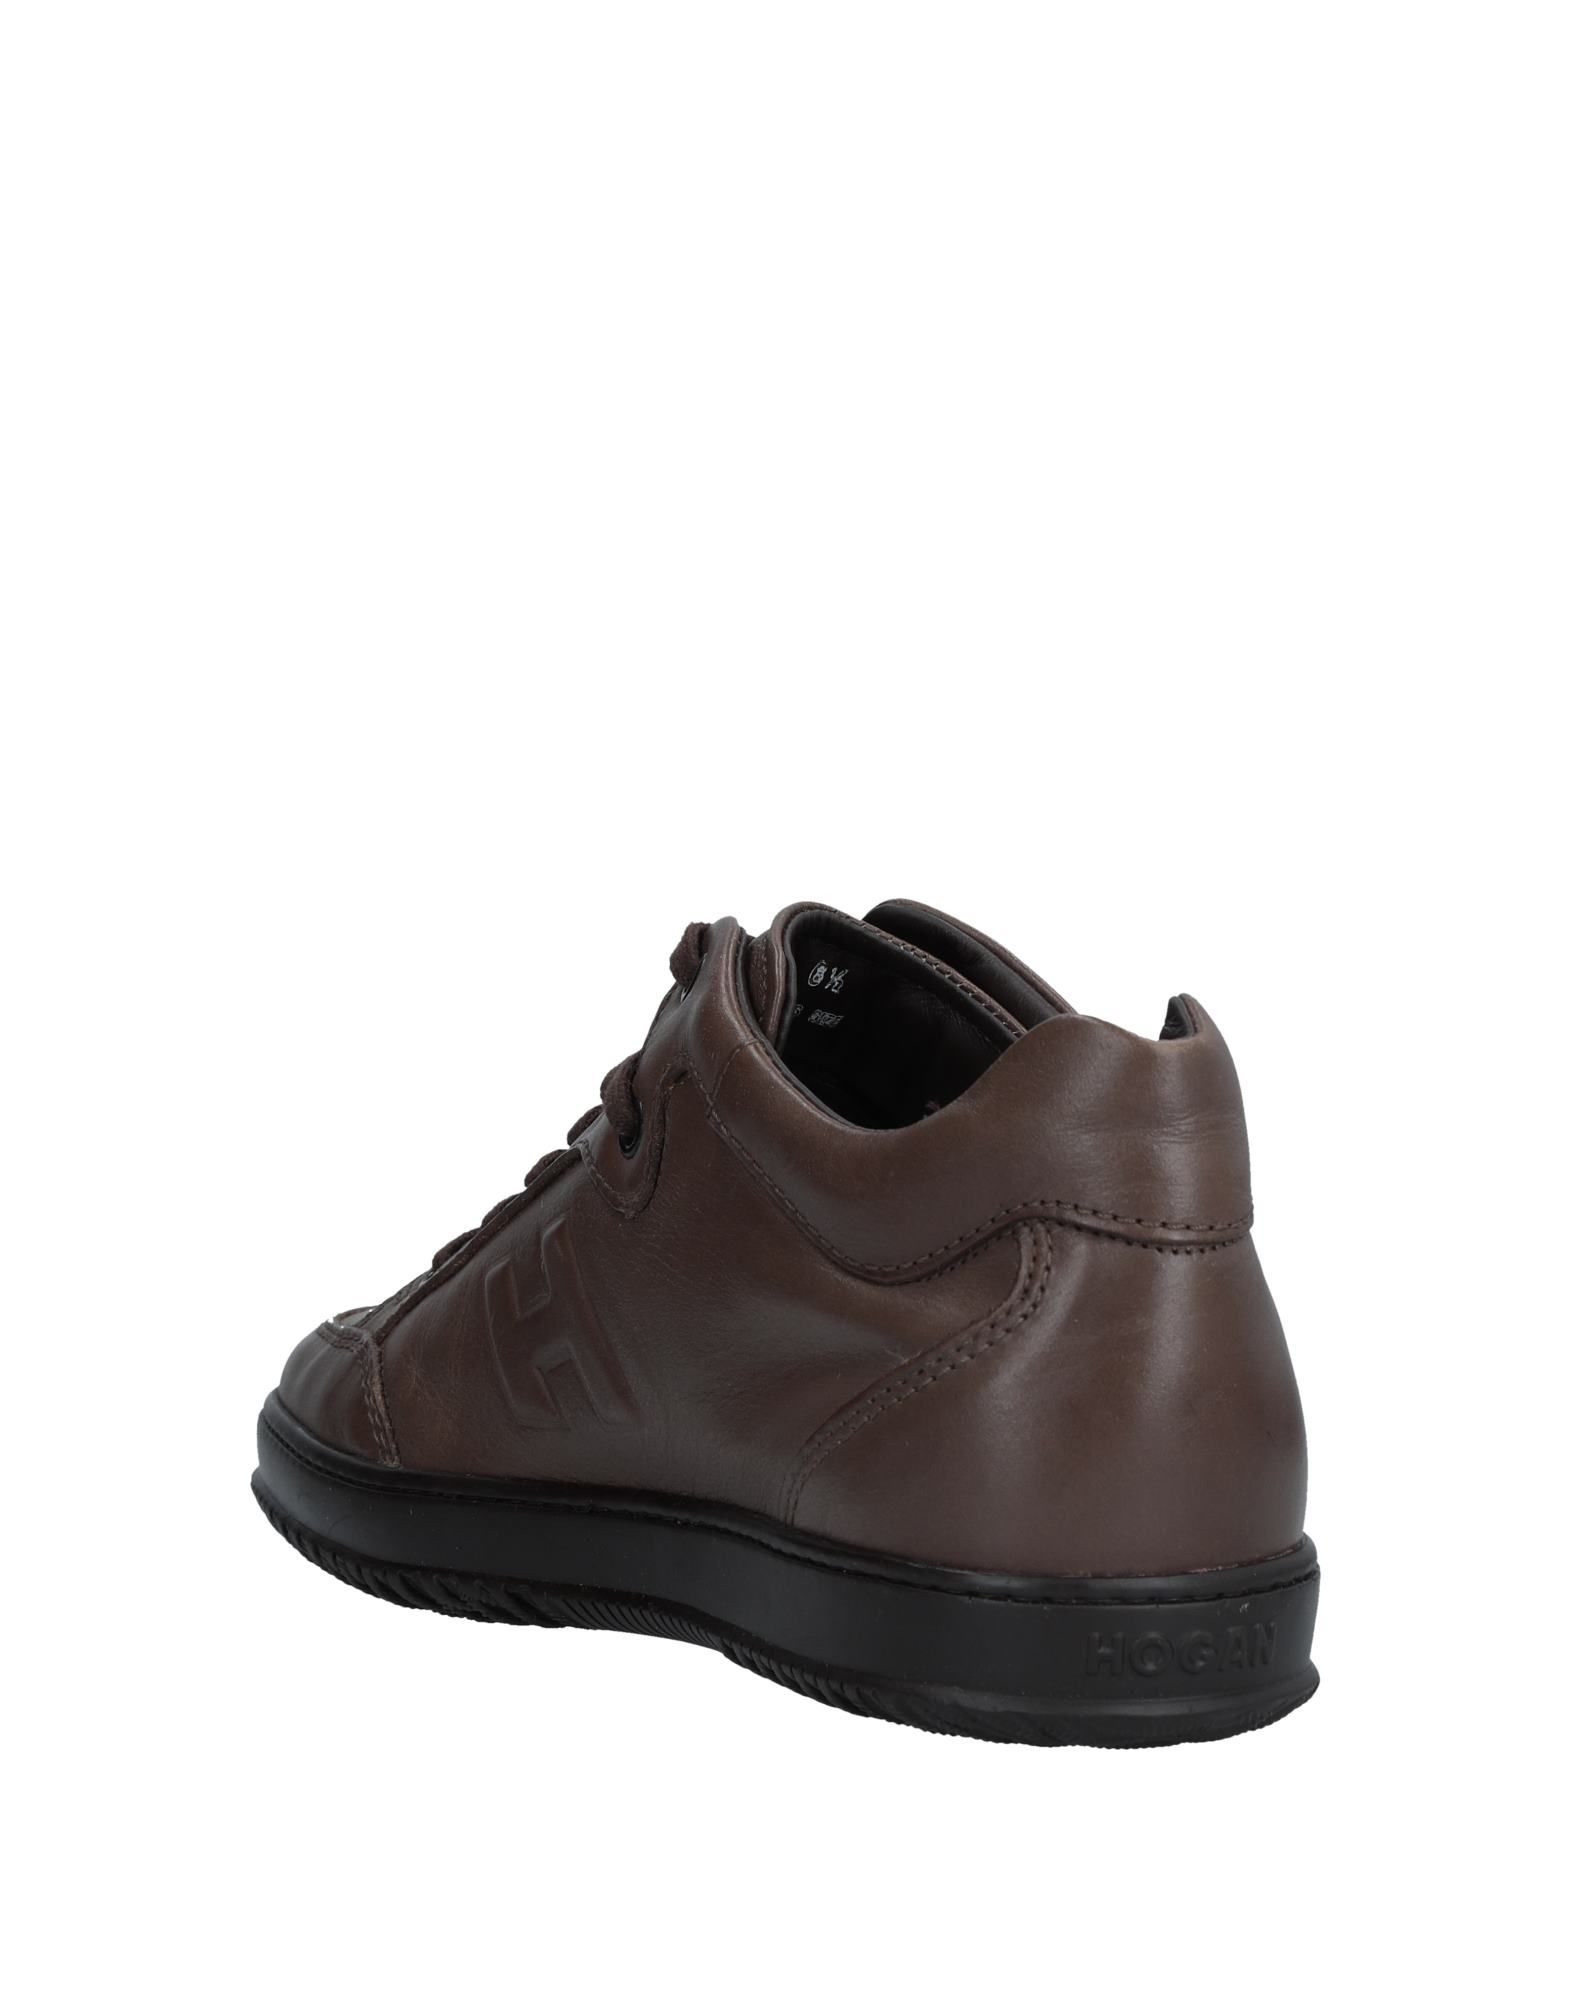 Hogan Sneakers Herren  11541743ML Gute Qualität beliebte Schuhe